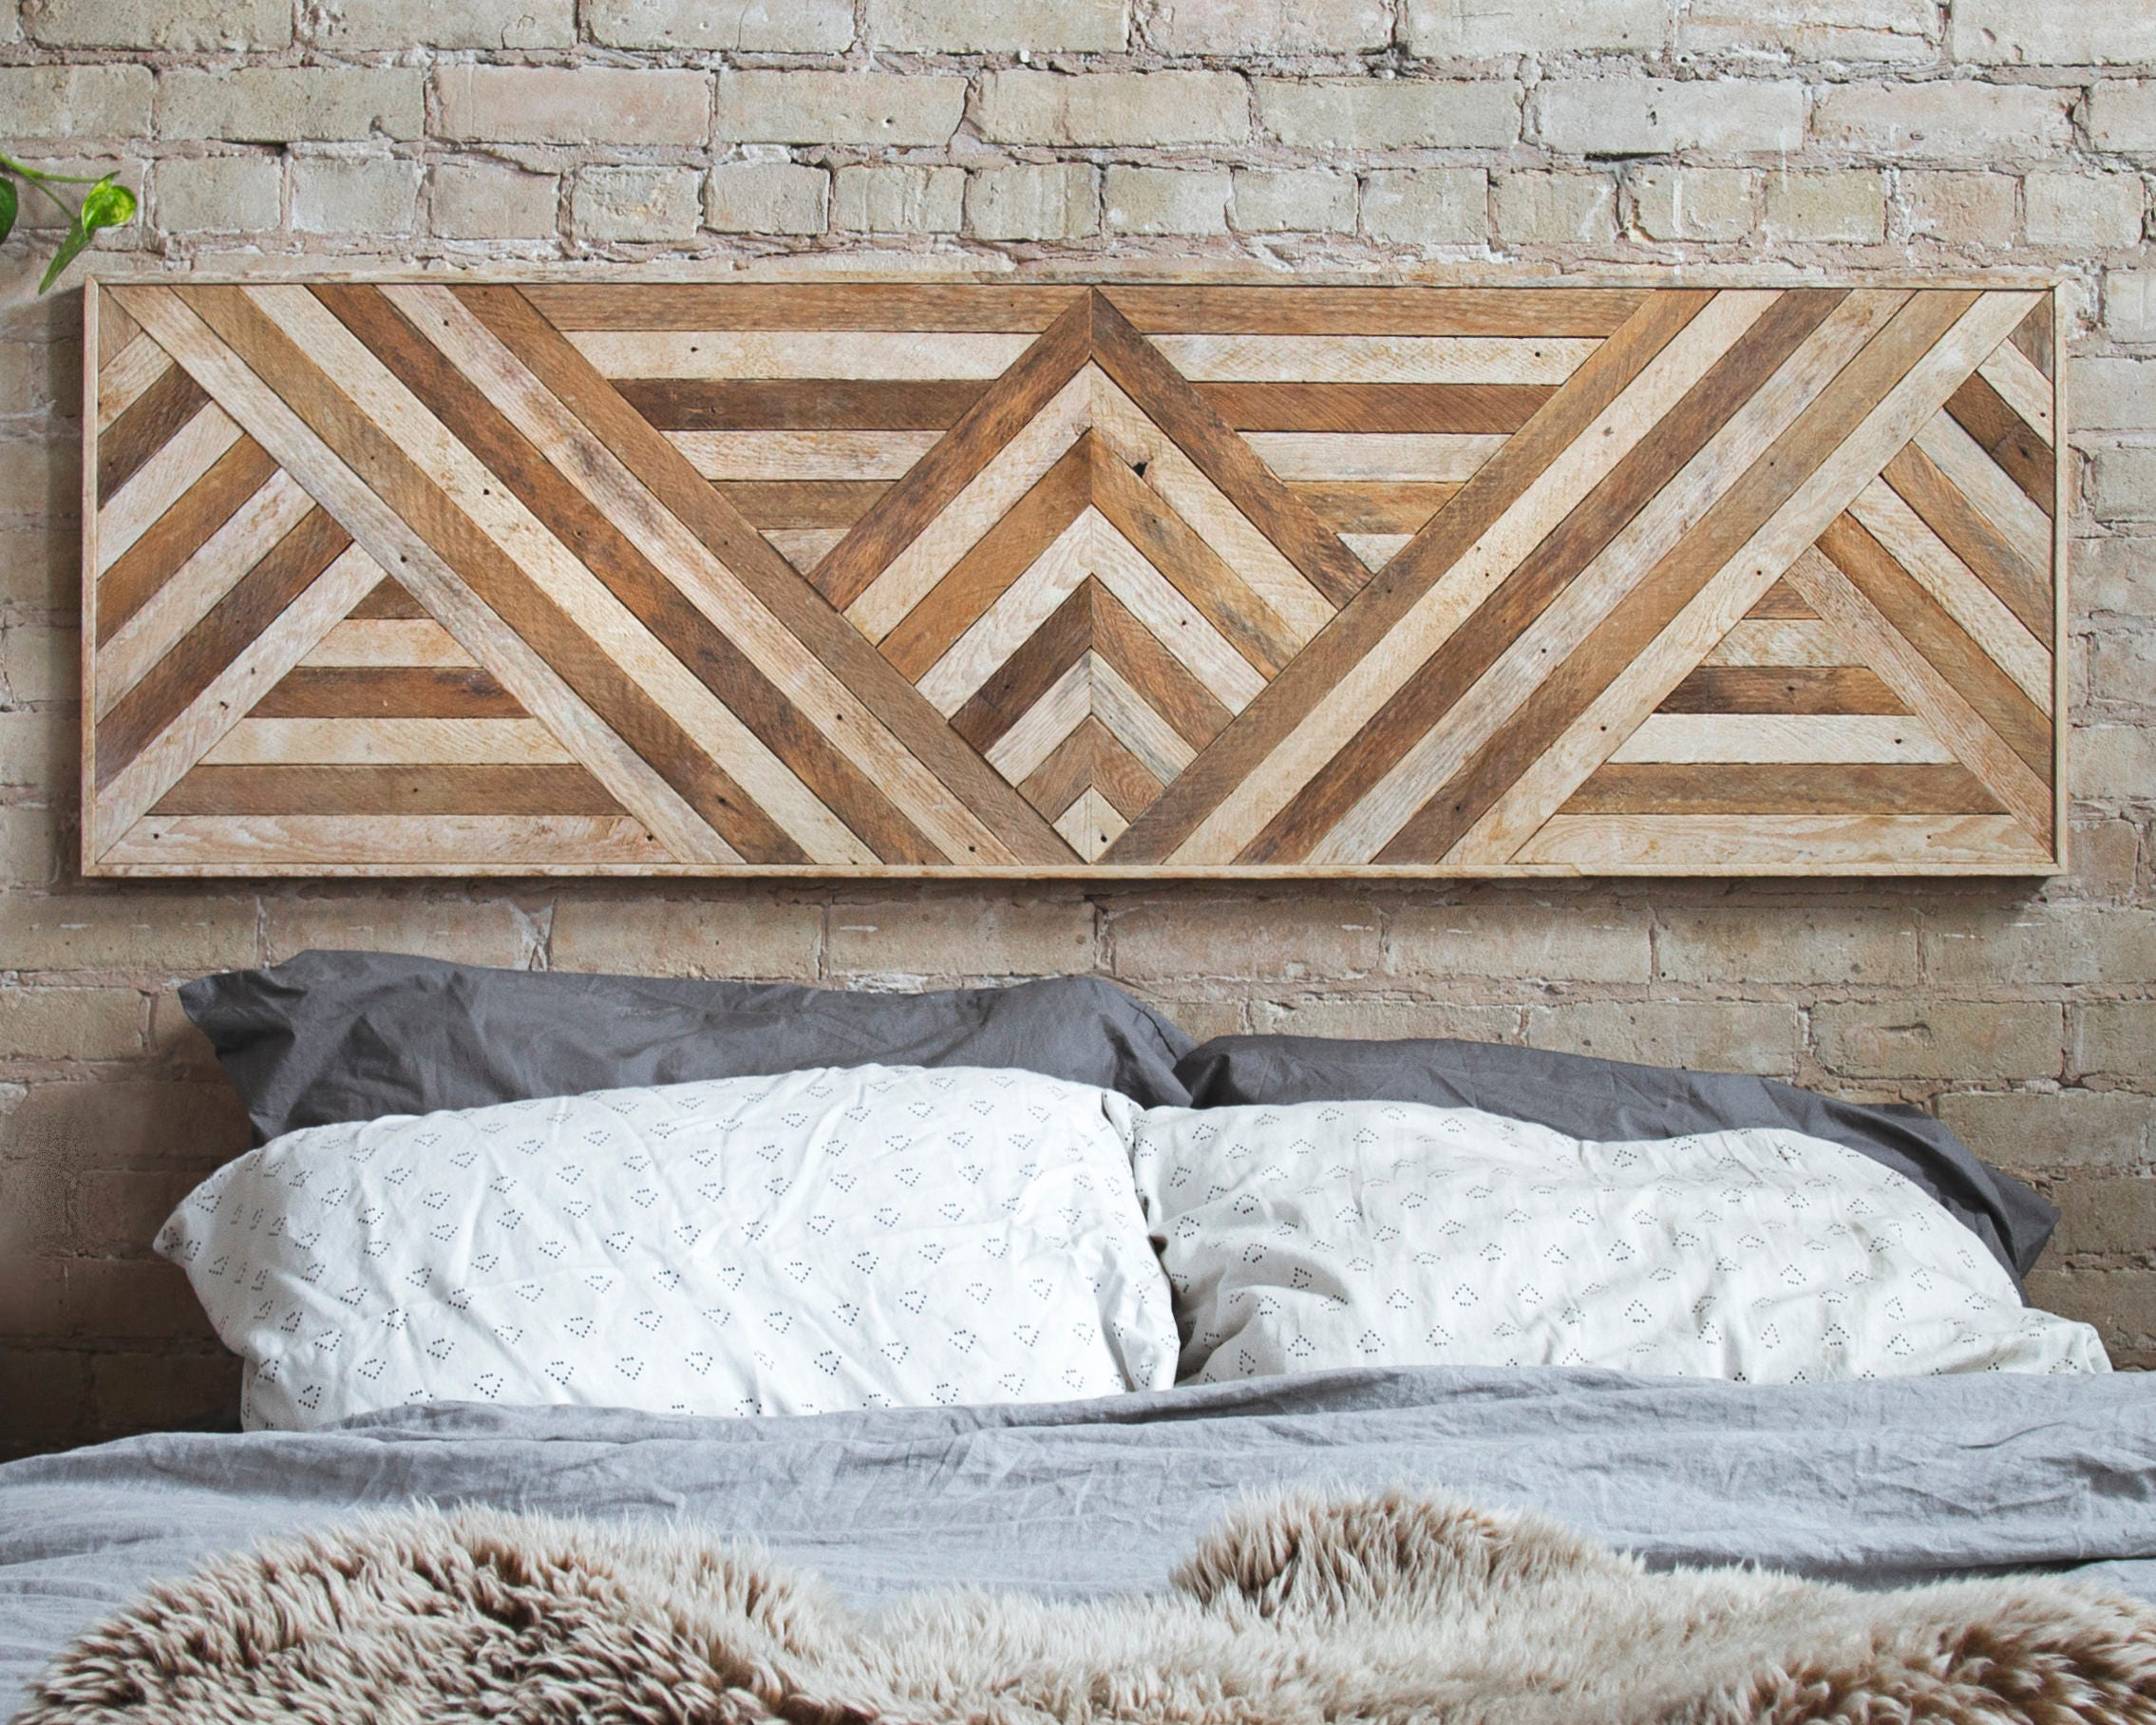 Reclaimed Wood Wall Art Queen Headboard Wood Wall Decor Geometric